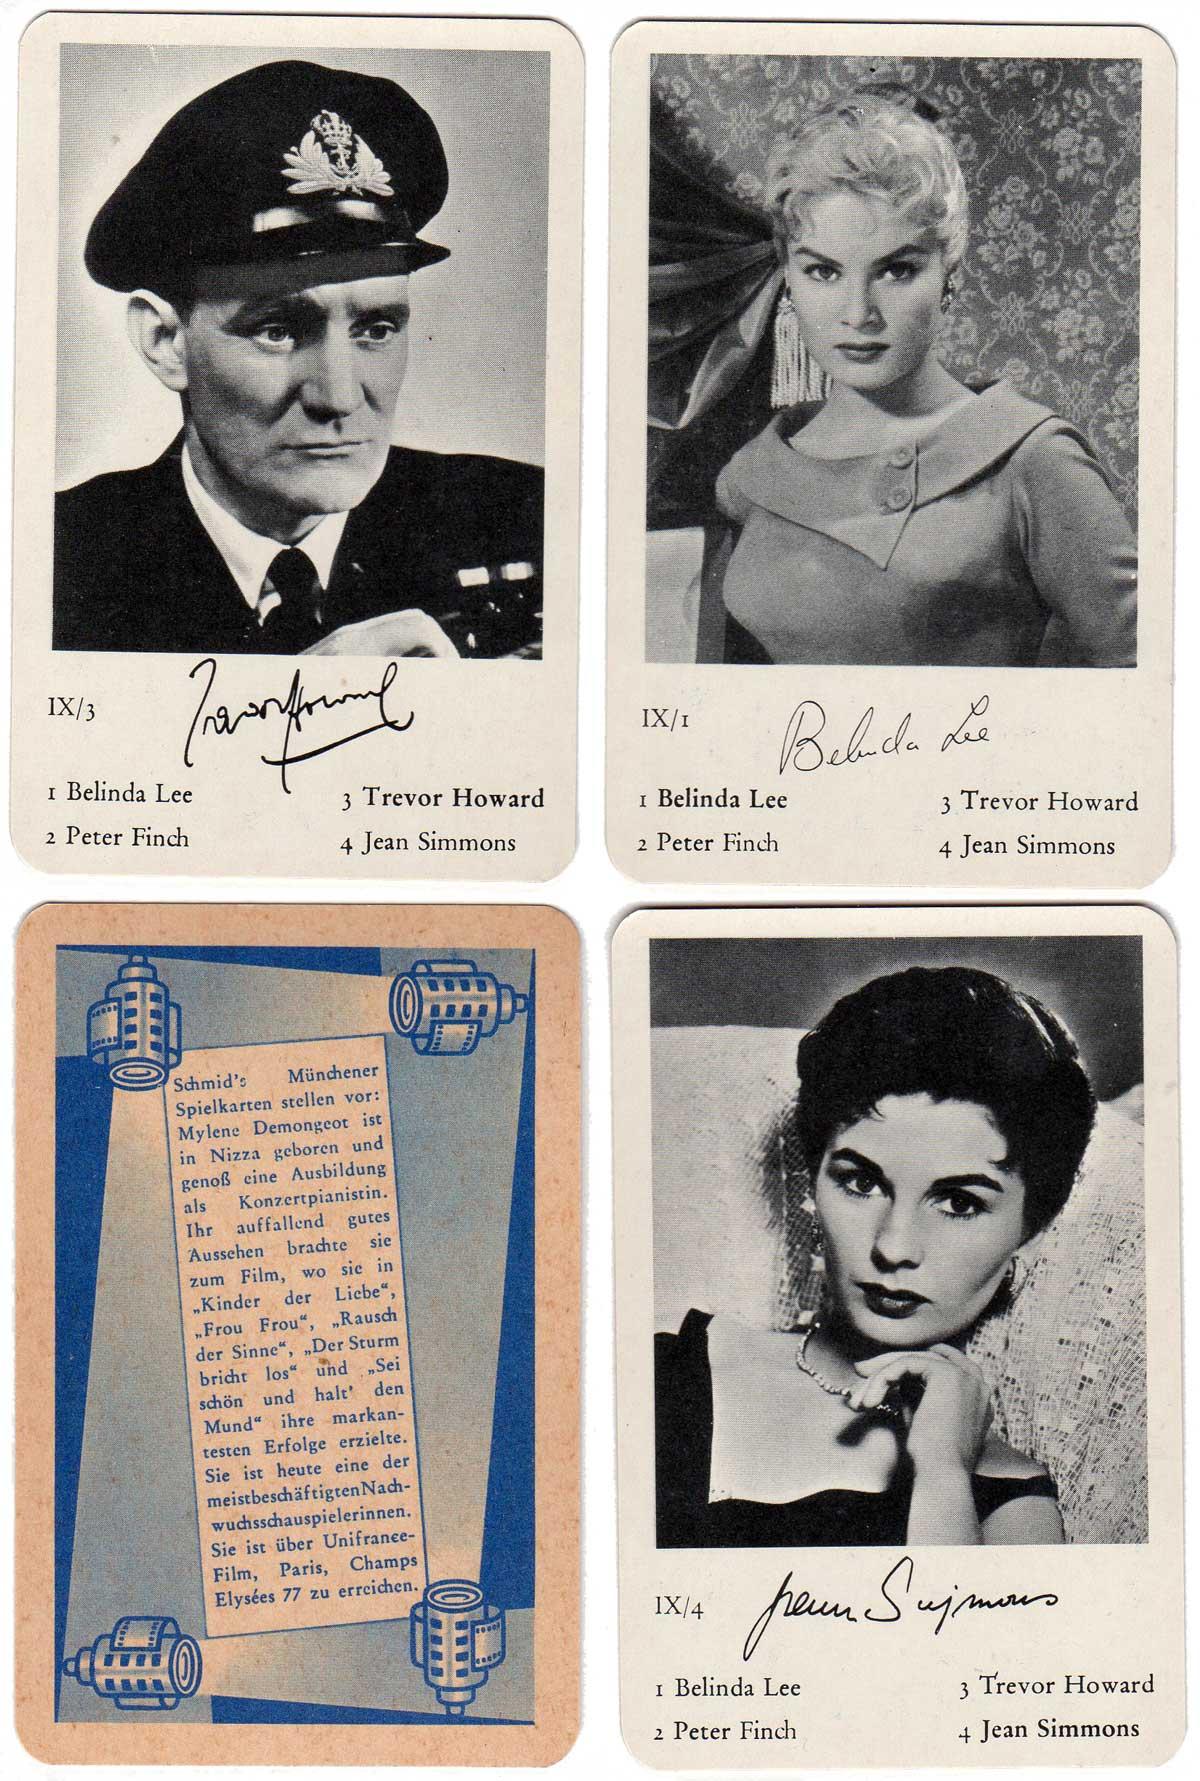 Filmstar-Parade Quartet card game published by Schmid, Munich, c.1958